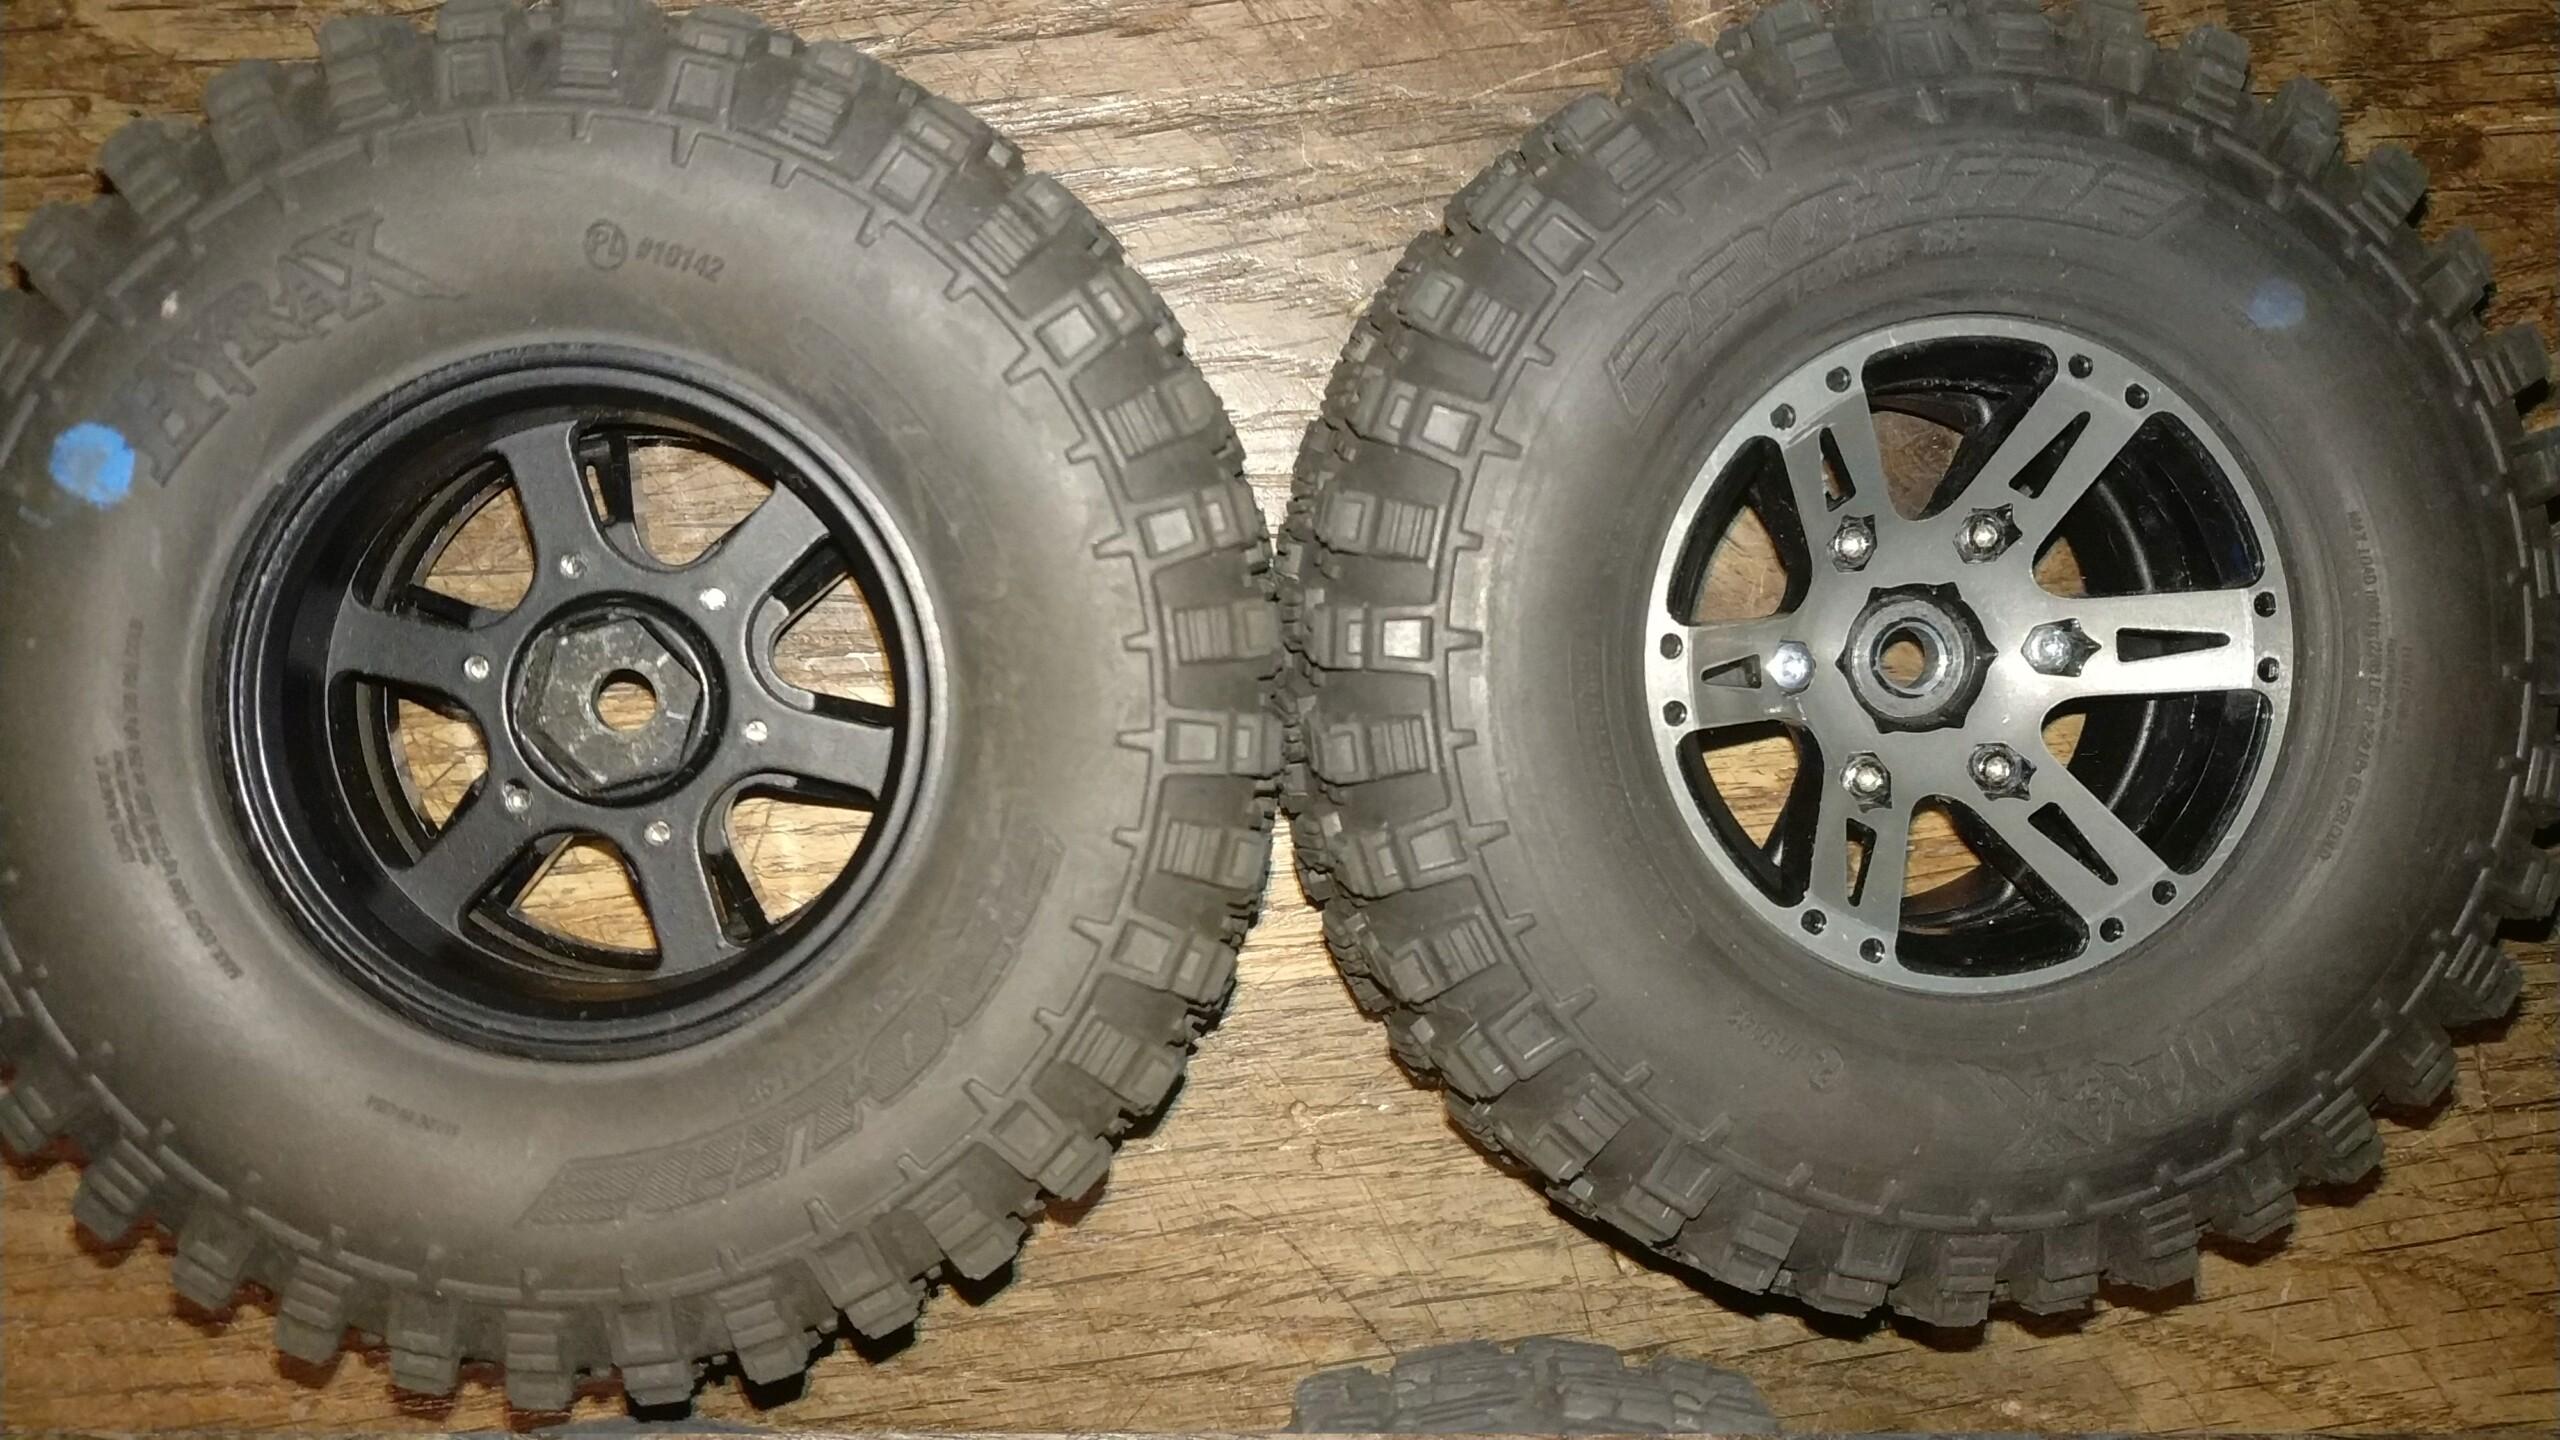 [VENDU] 4 pneus Proline Hyrax Predator 1.9 en 106mm.  Img_2689